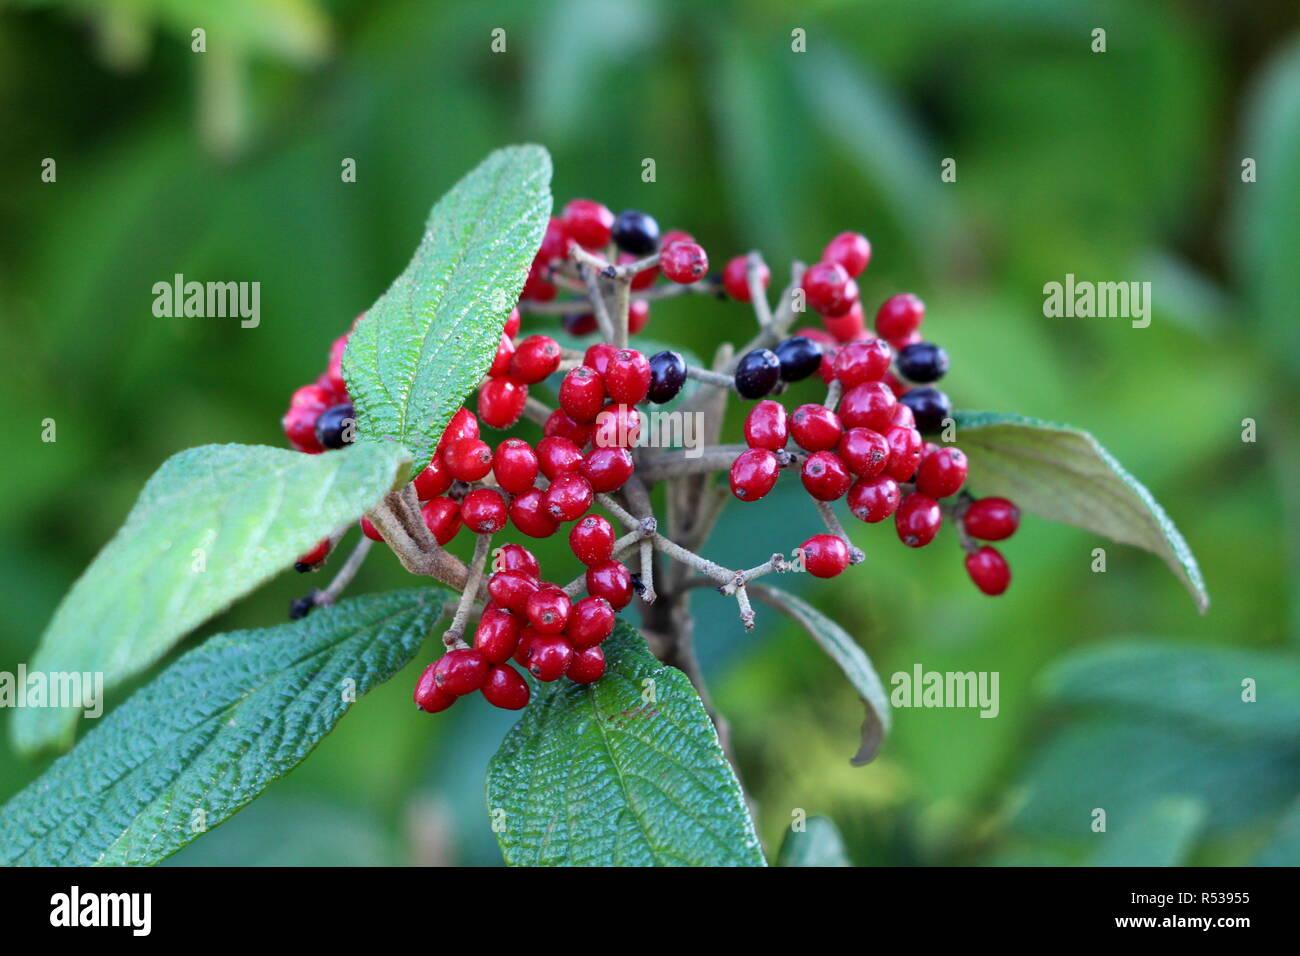 Leatherleaf viburnum or Viburnum rhytidophyllum vigorous coarsely textured evergreen shrub plant cluster of bright red and black berries - Stock Image